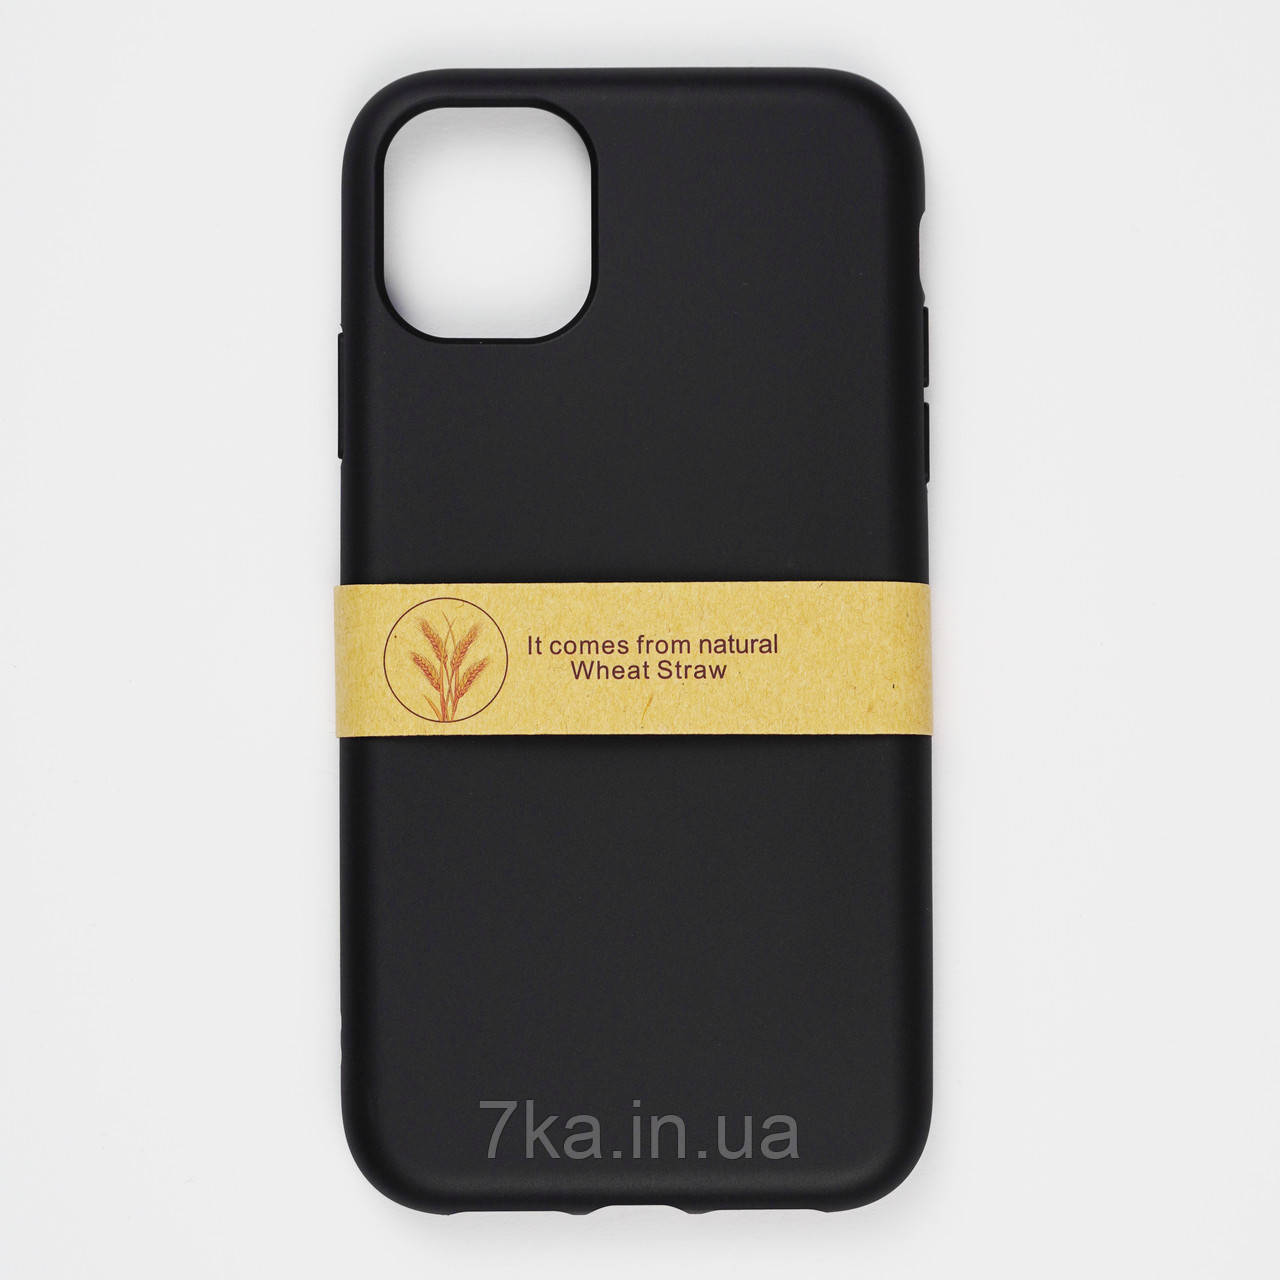 Биоразлагаемый чехол ECO Wheat Straw для iPhone 11 Pro Black